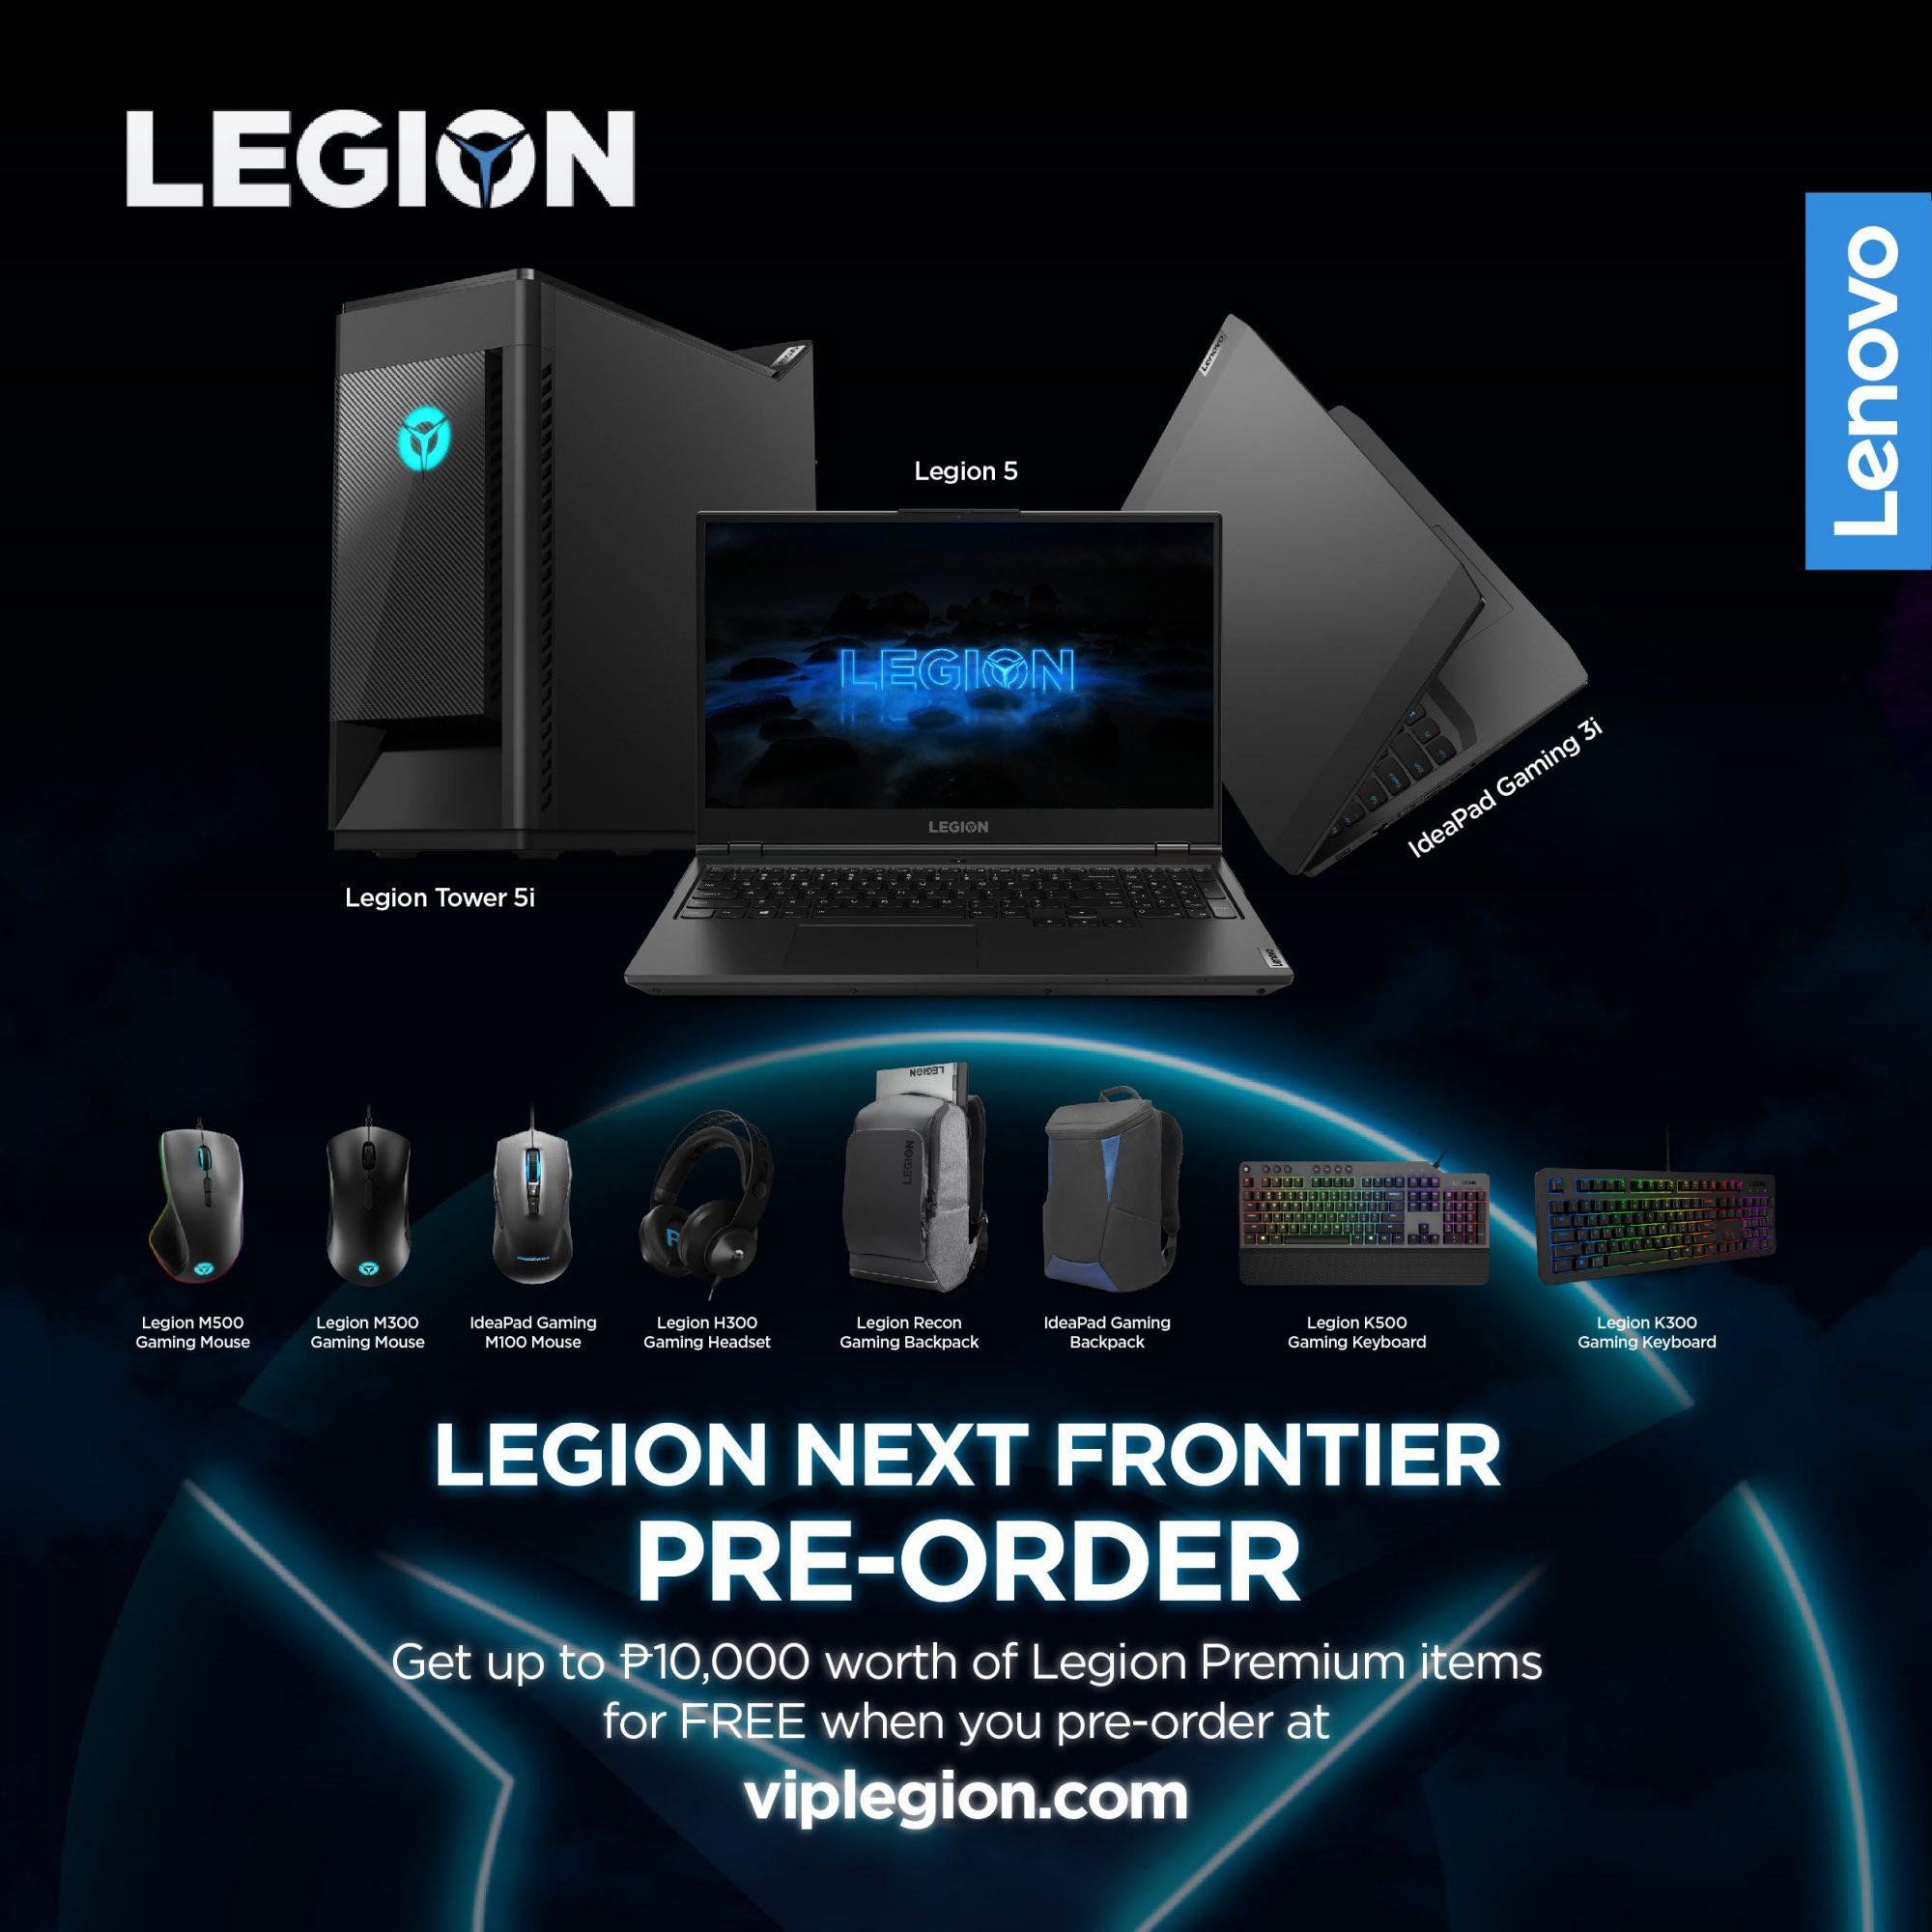 Lenovo Legion pre-order promo